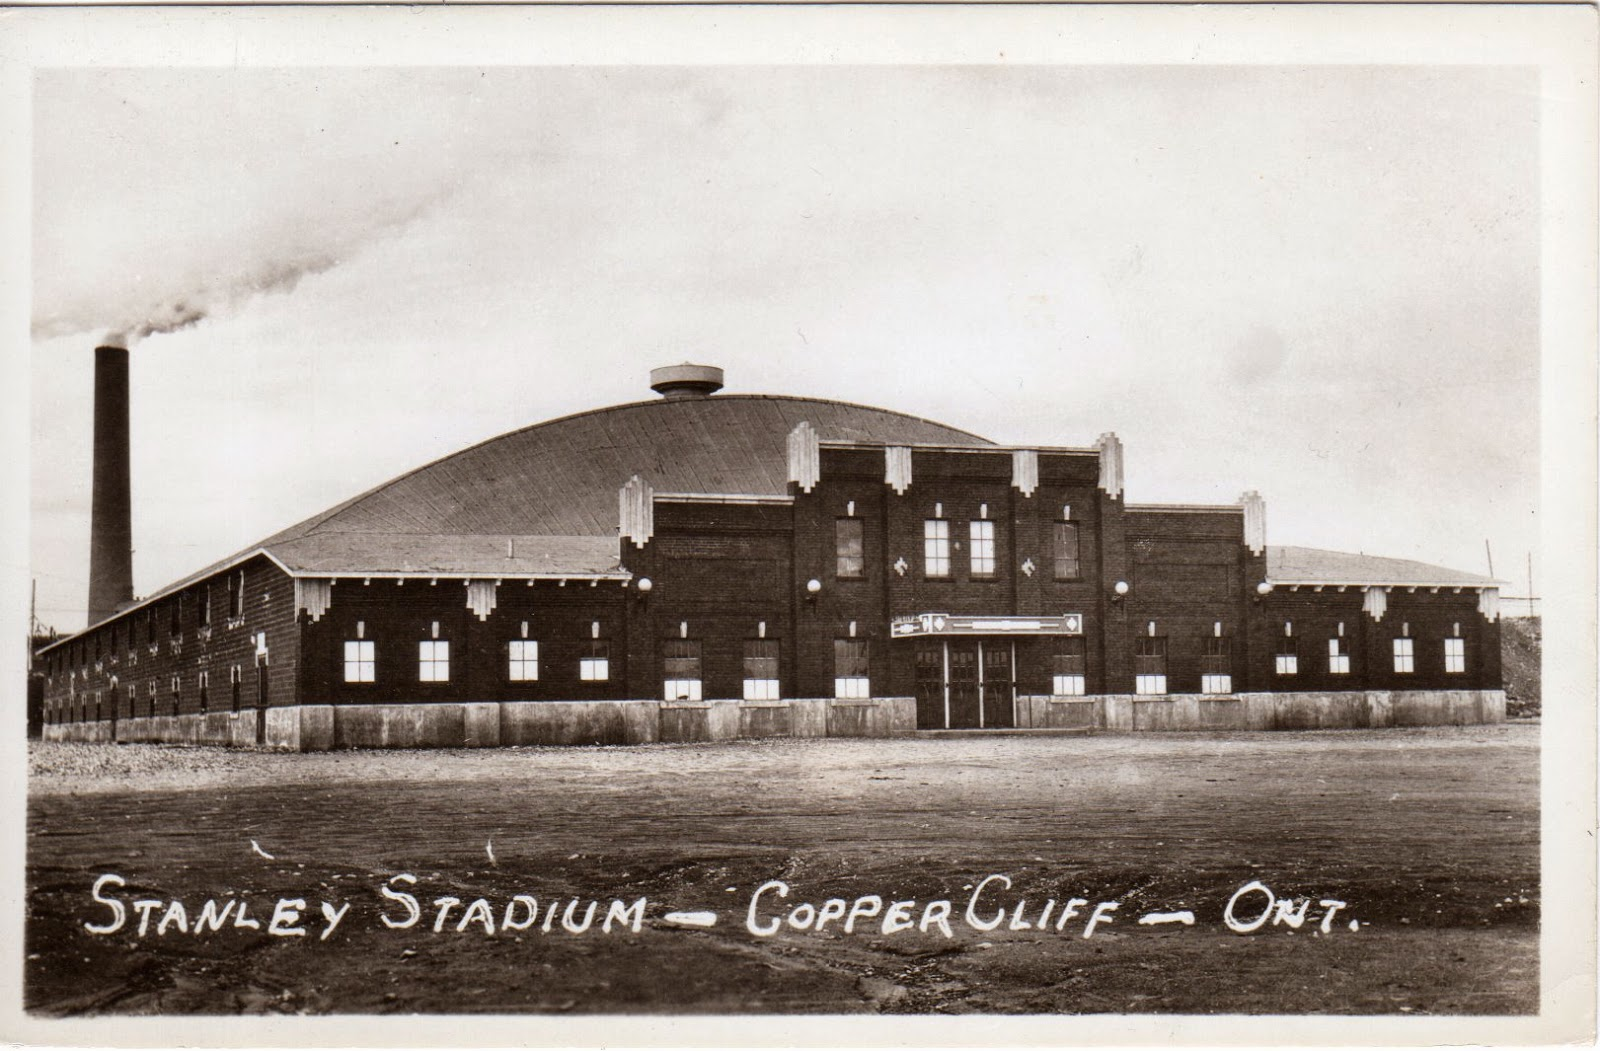 Stanley Stadium